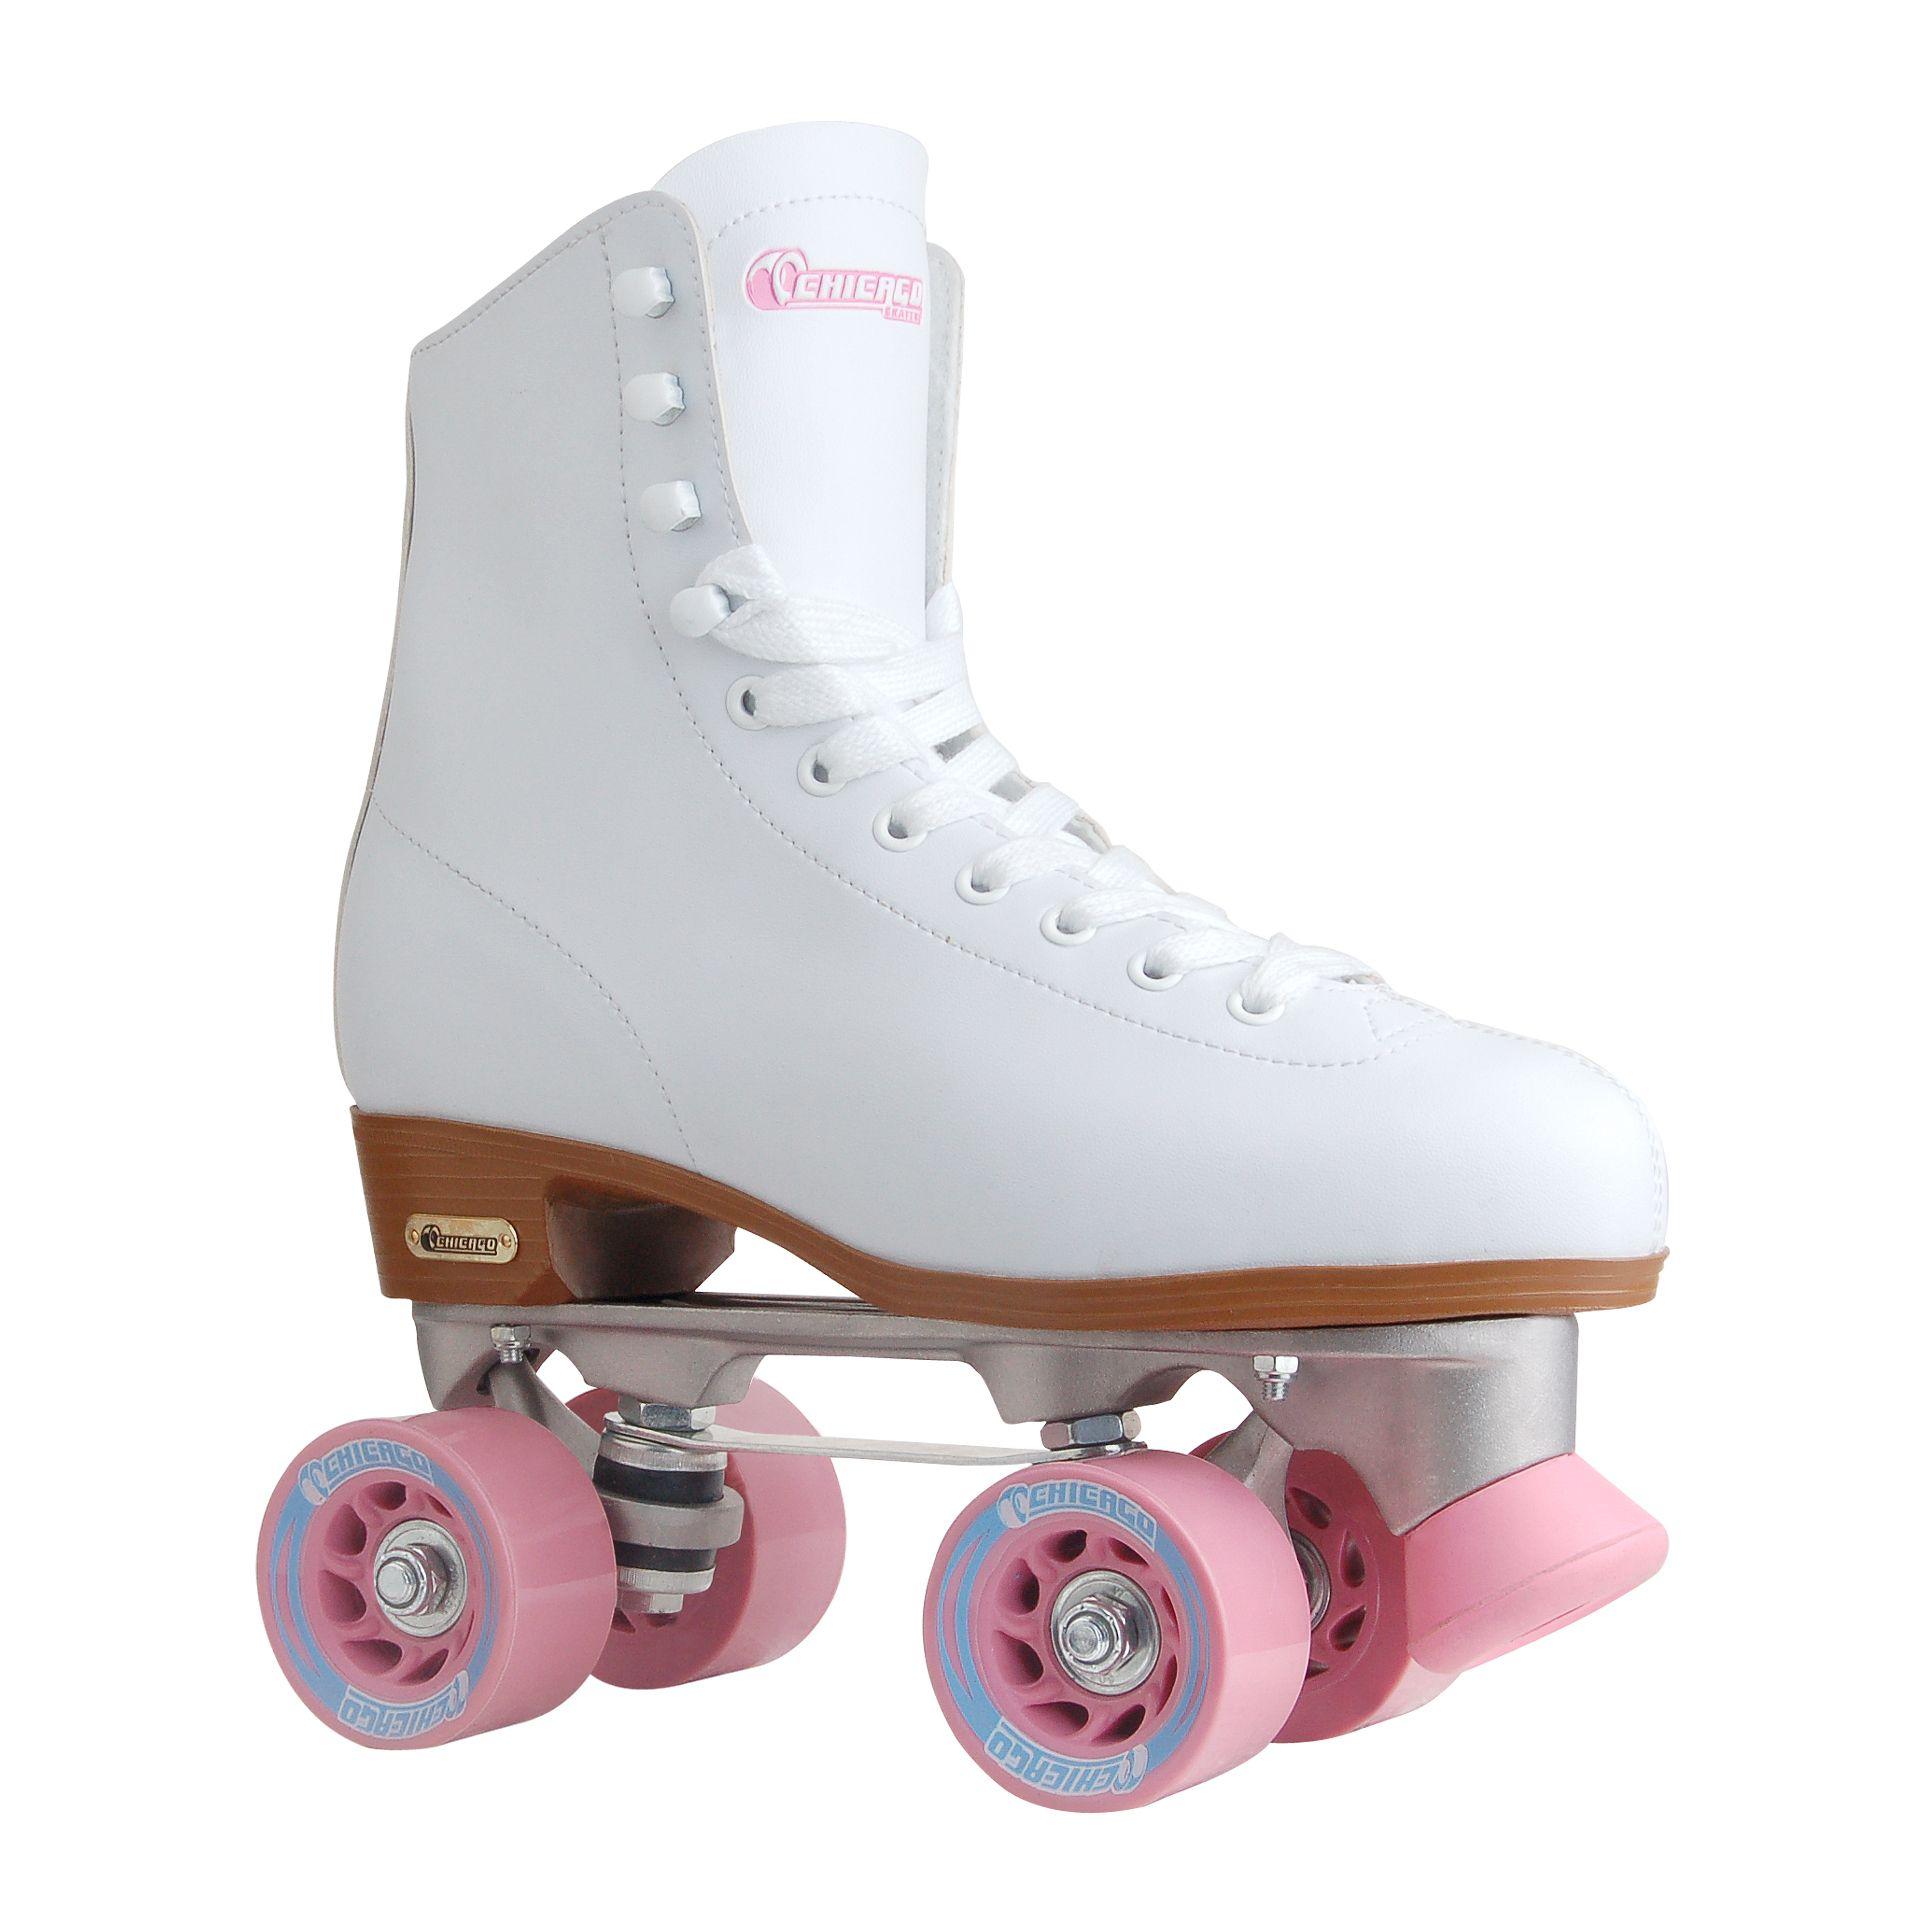 Roller skating rink quad cities - Noimagefound